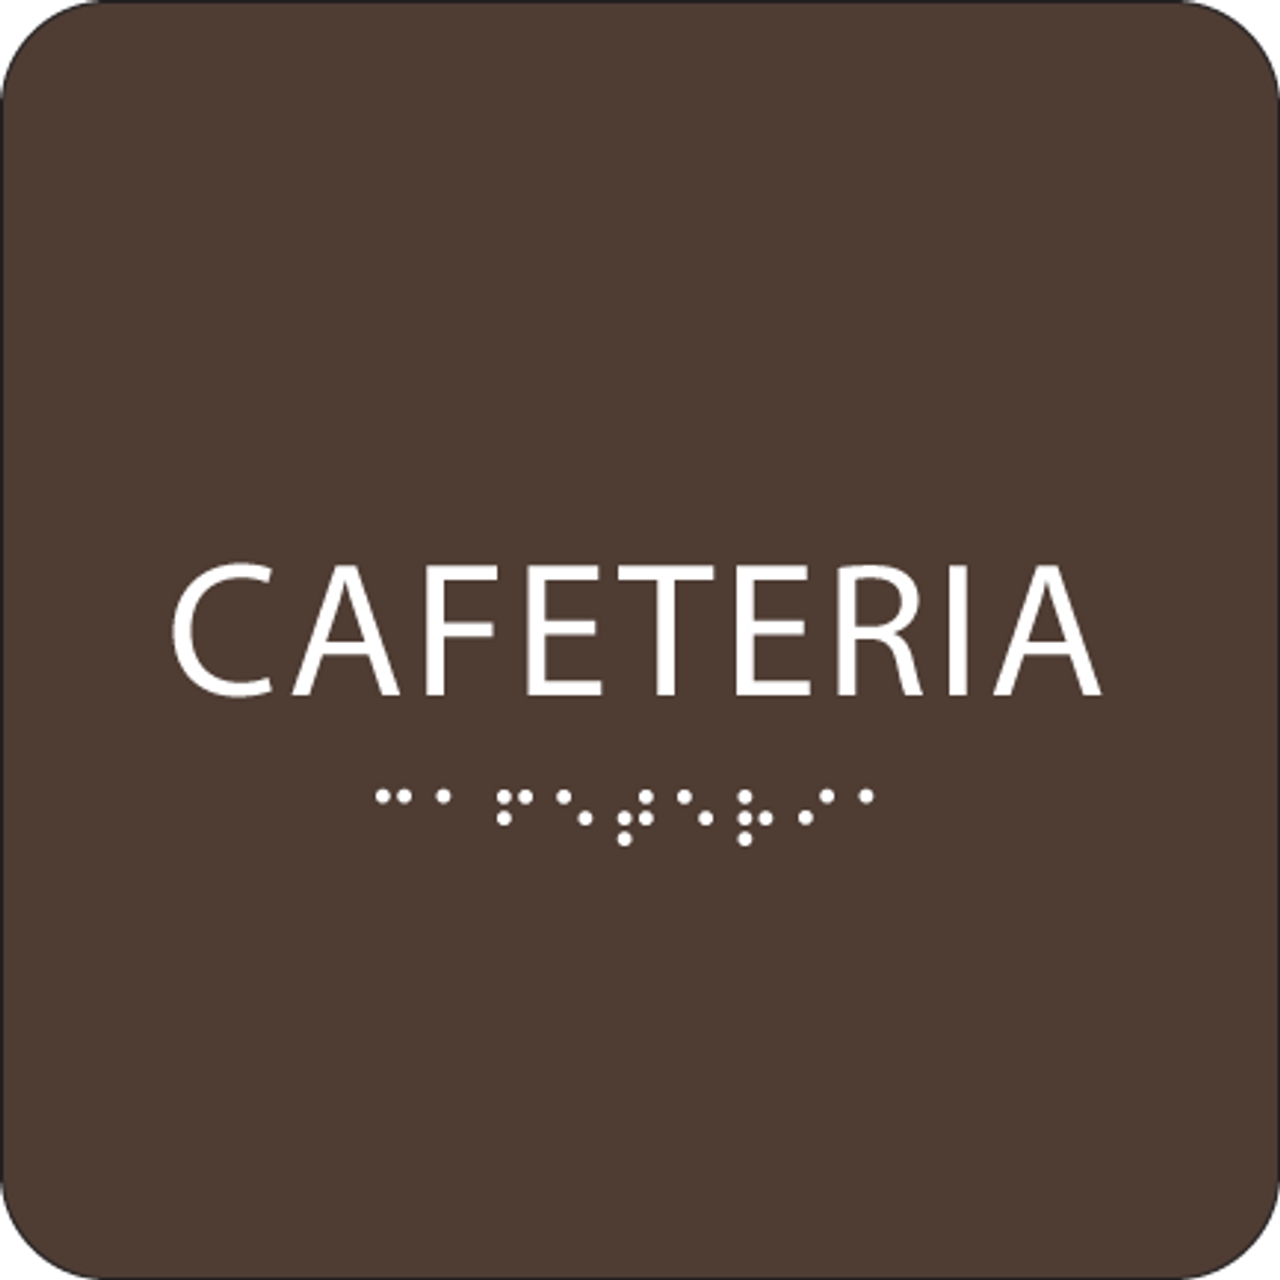 Dark Brown Cafeteria ADA Sign